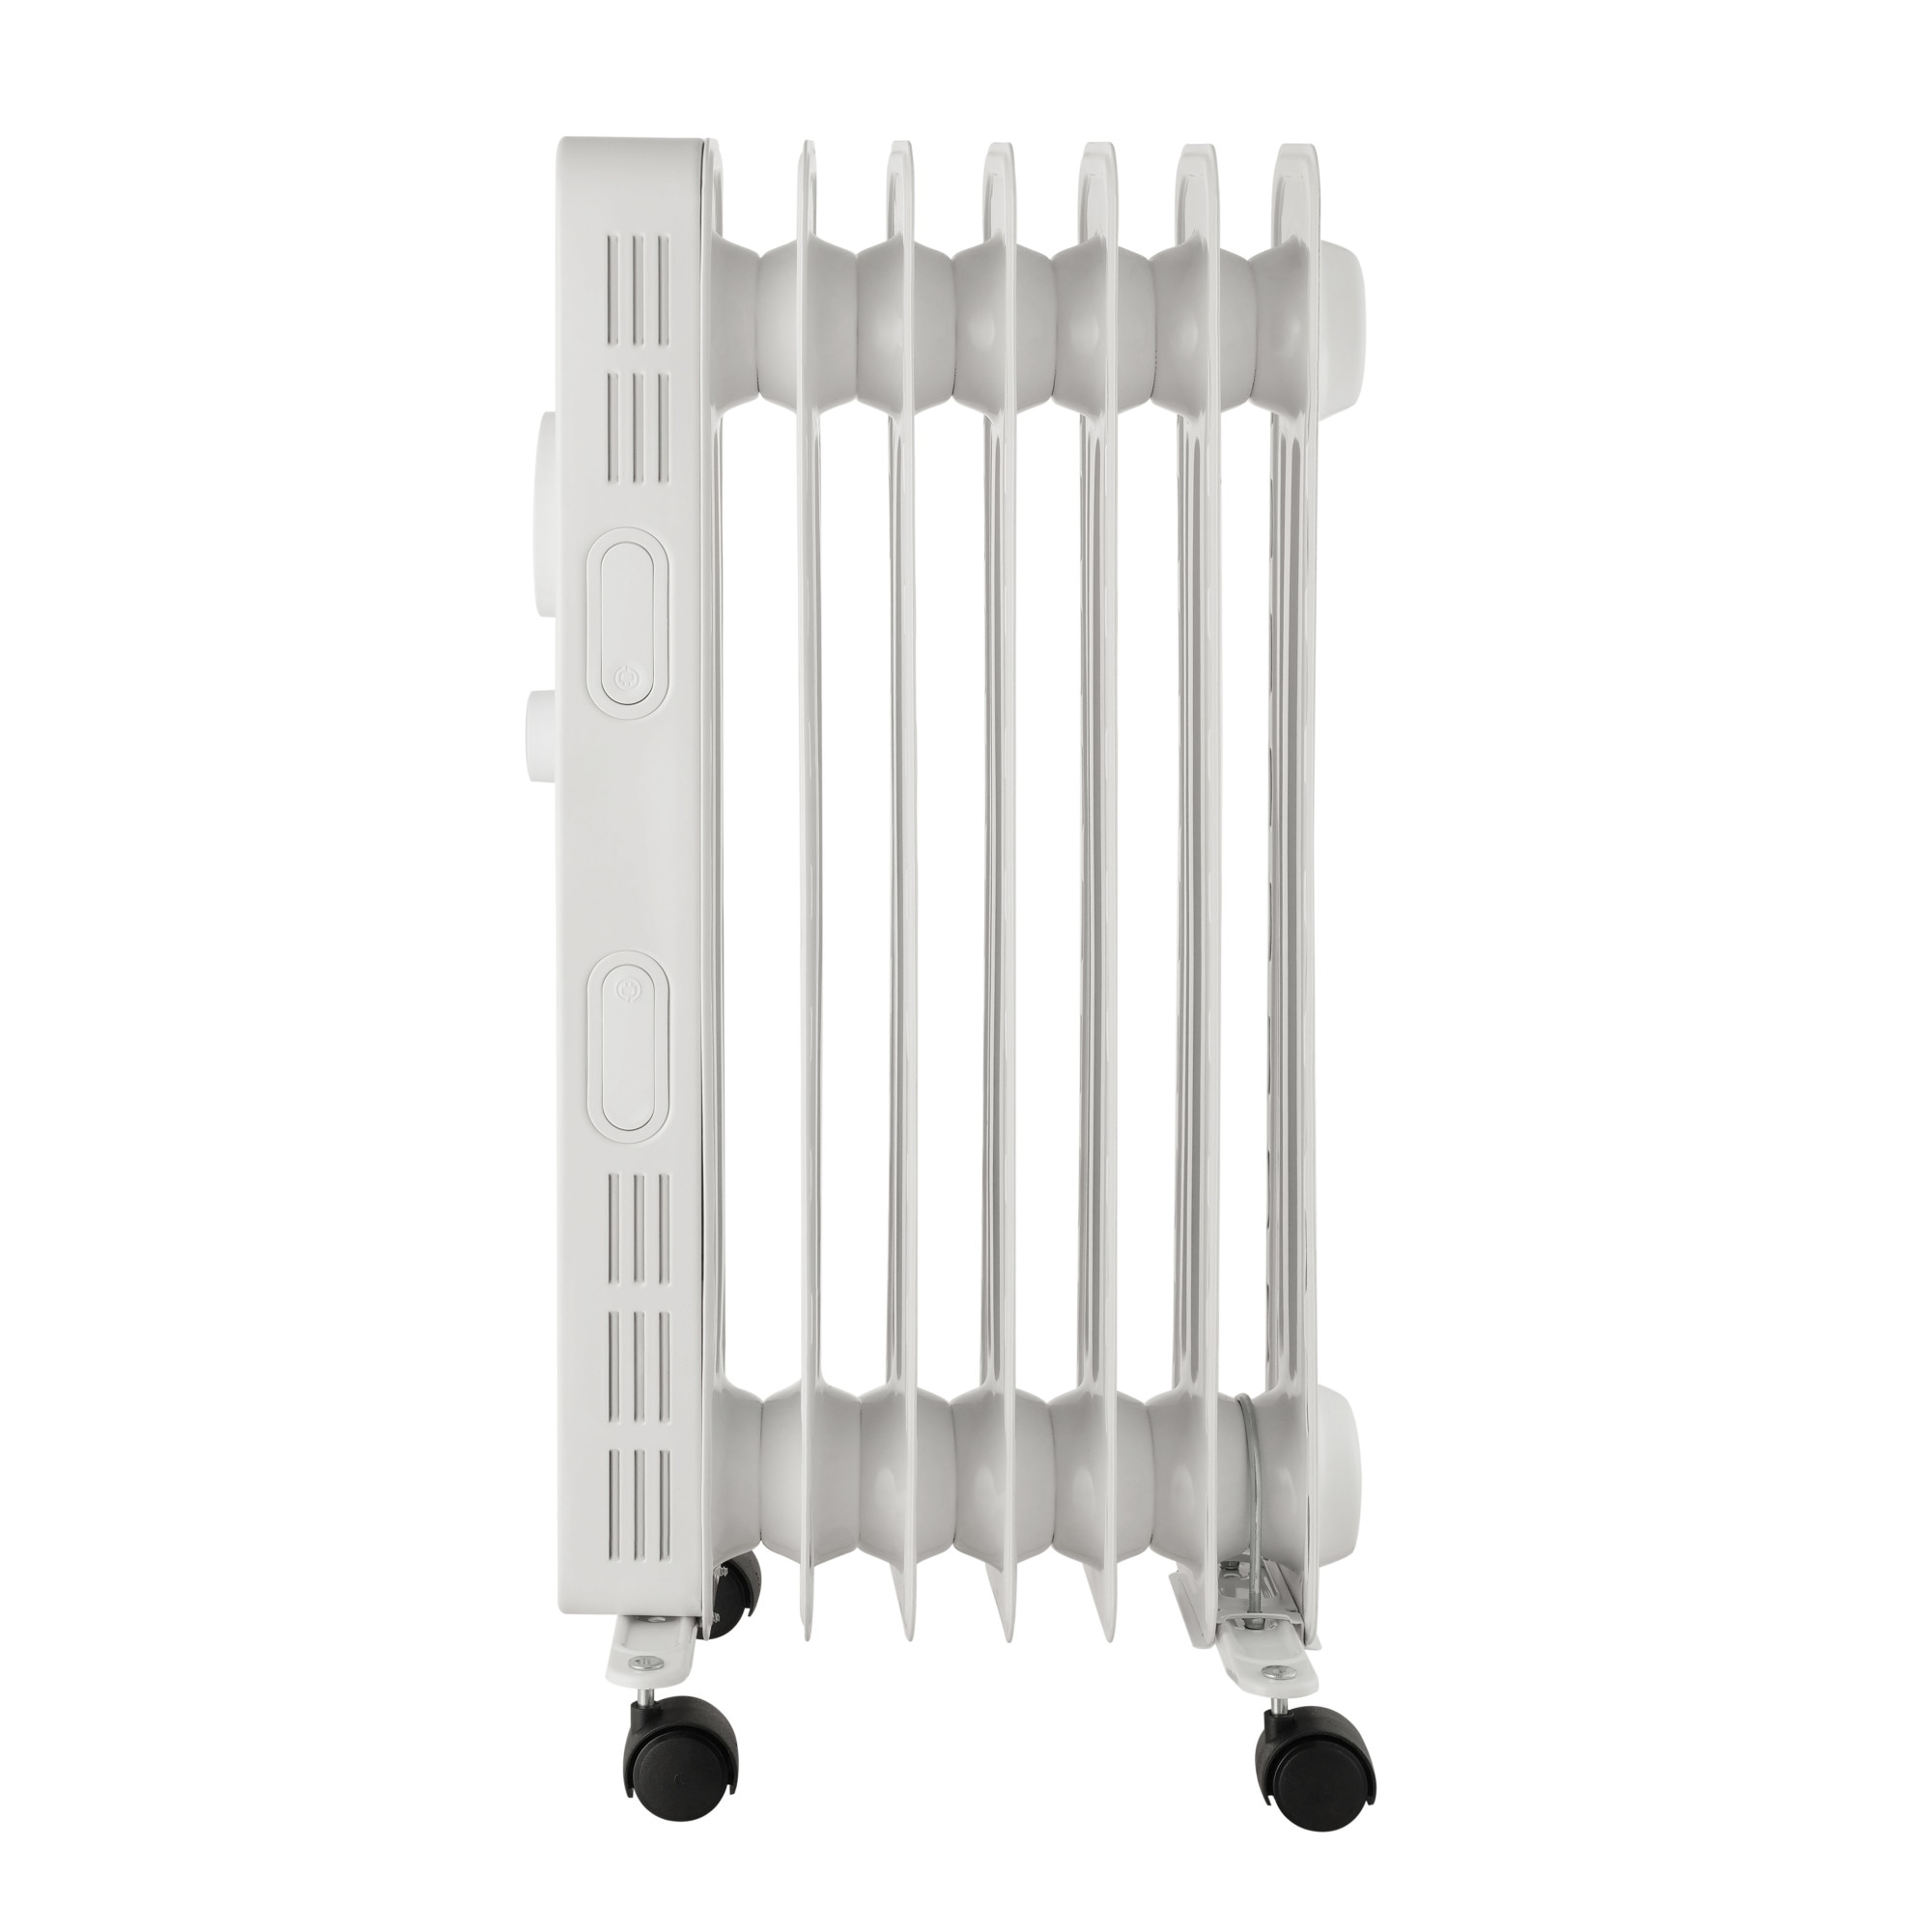 Fotografie Calorifer electric cu ulei Concept RO3307, 1500 W, 7 elementi, Termostat reglabil, 3 trepte